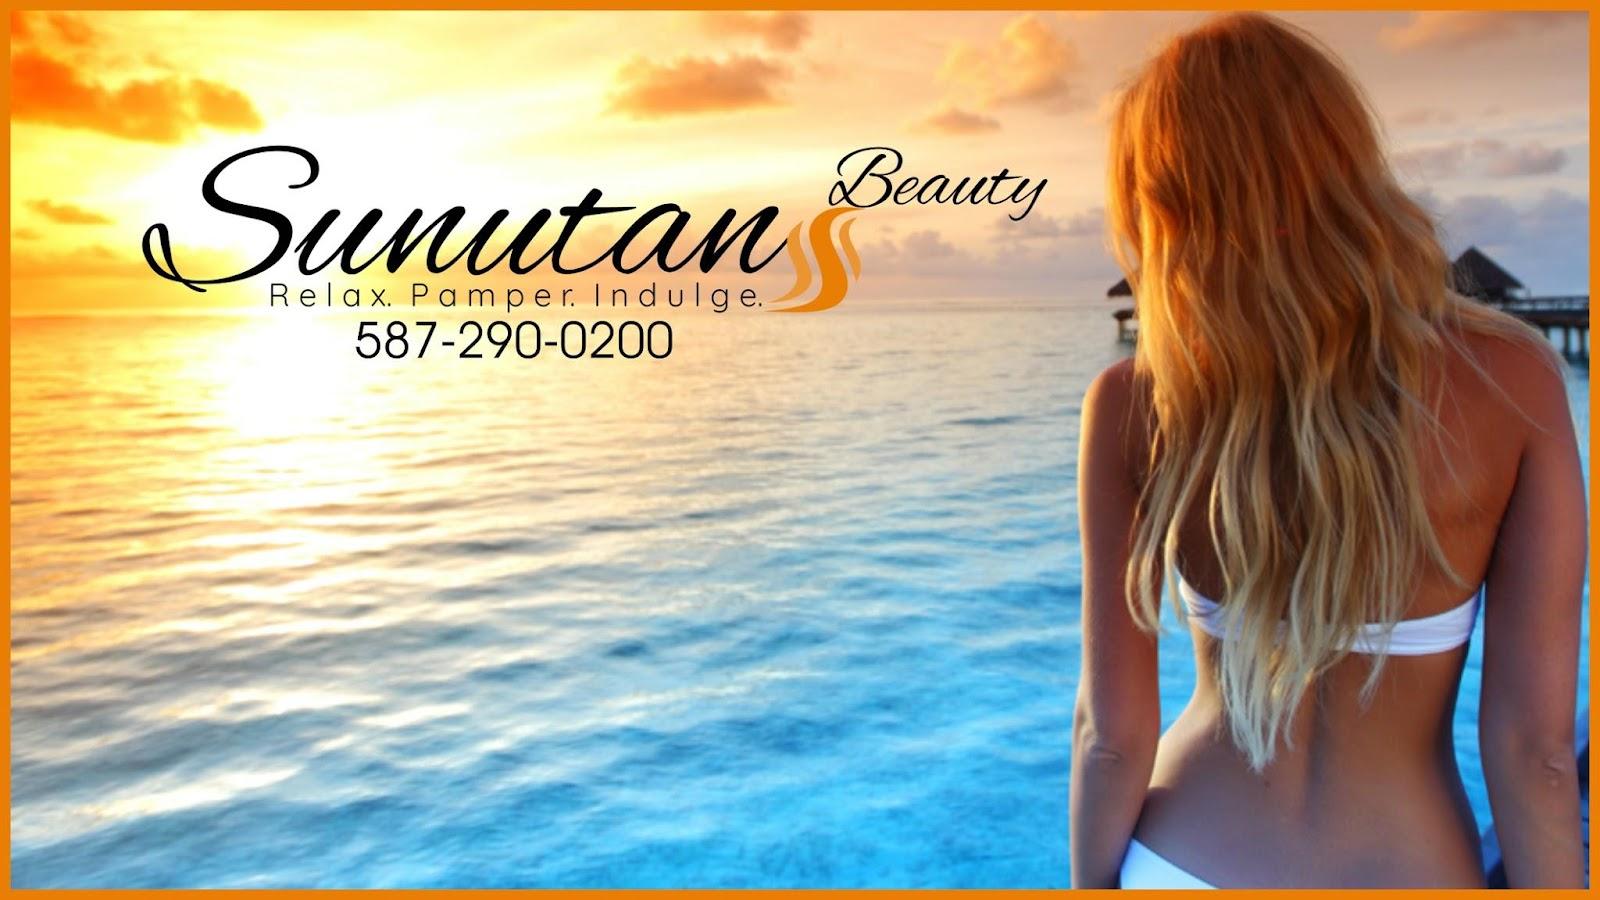 Tanning, Wellness, Sunutan Beauty, St Albert, Edmonton, g.jpg